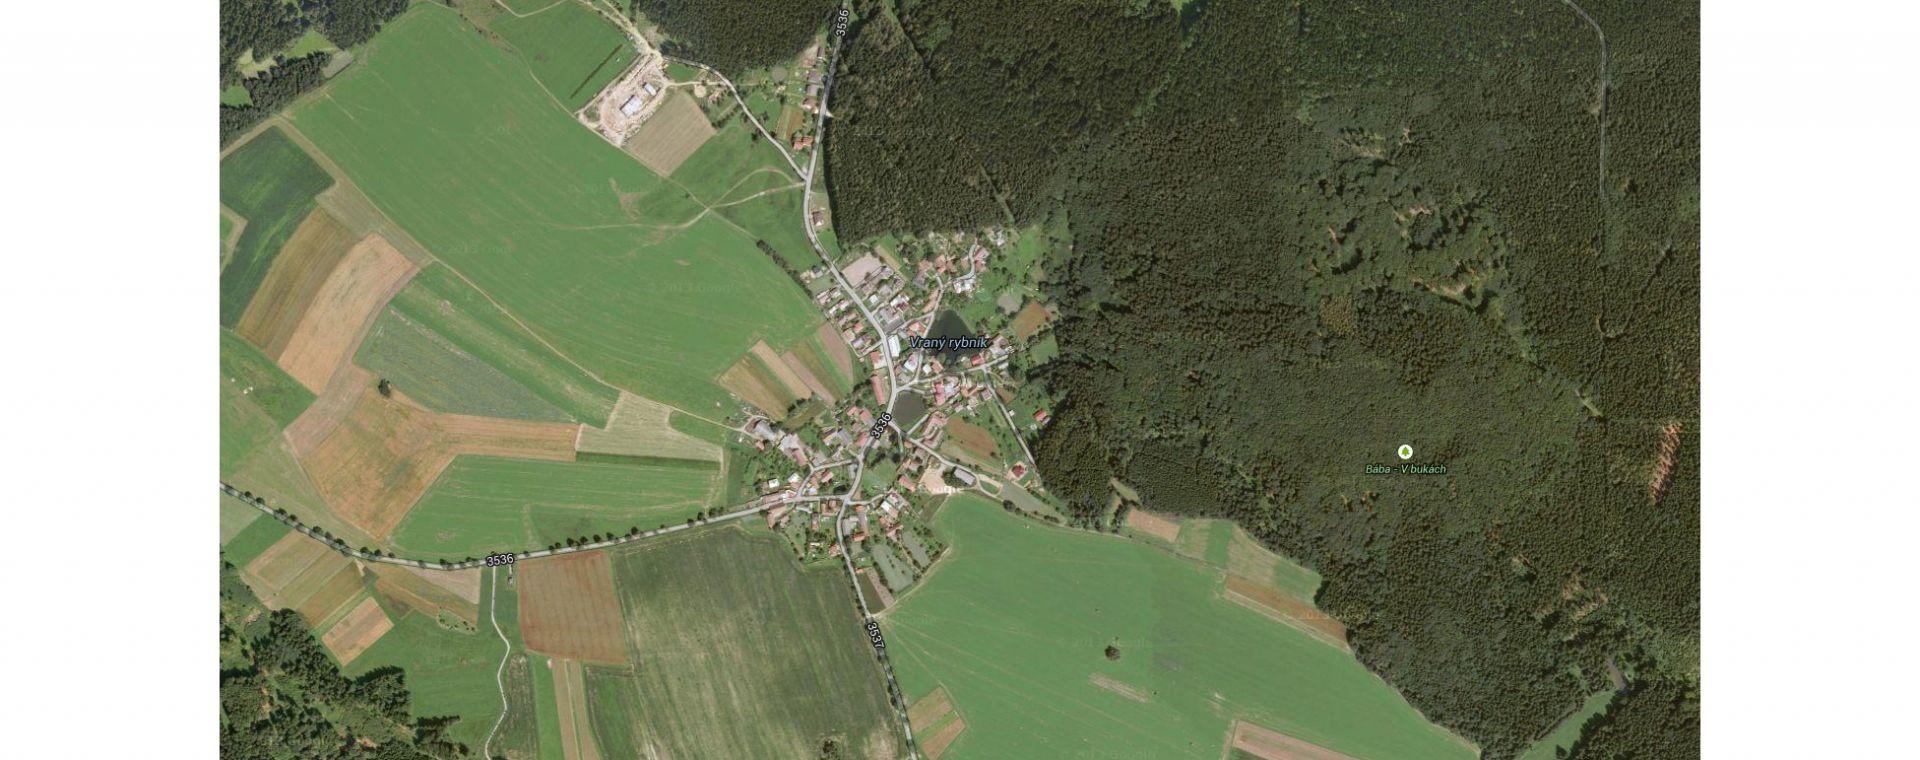 New proposal of masterplan of Bohdalov, Vysočina, 10/2014, CZ